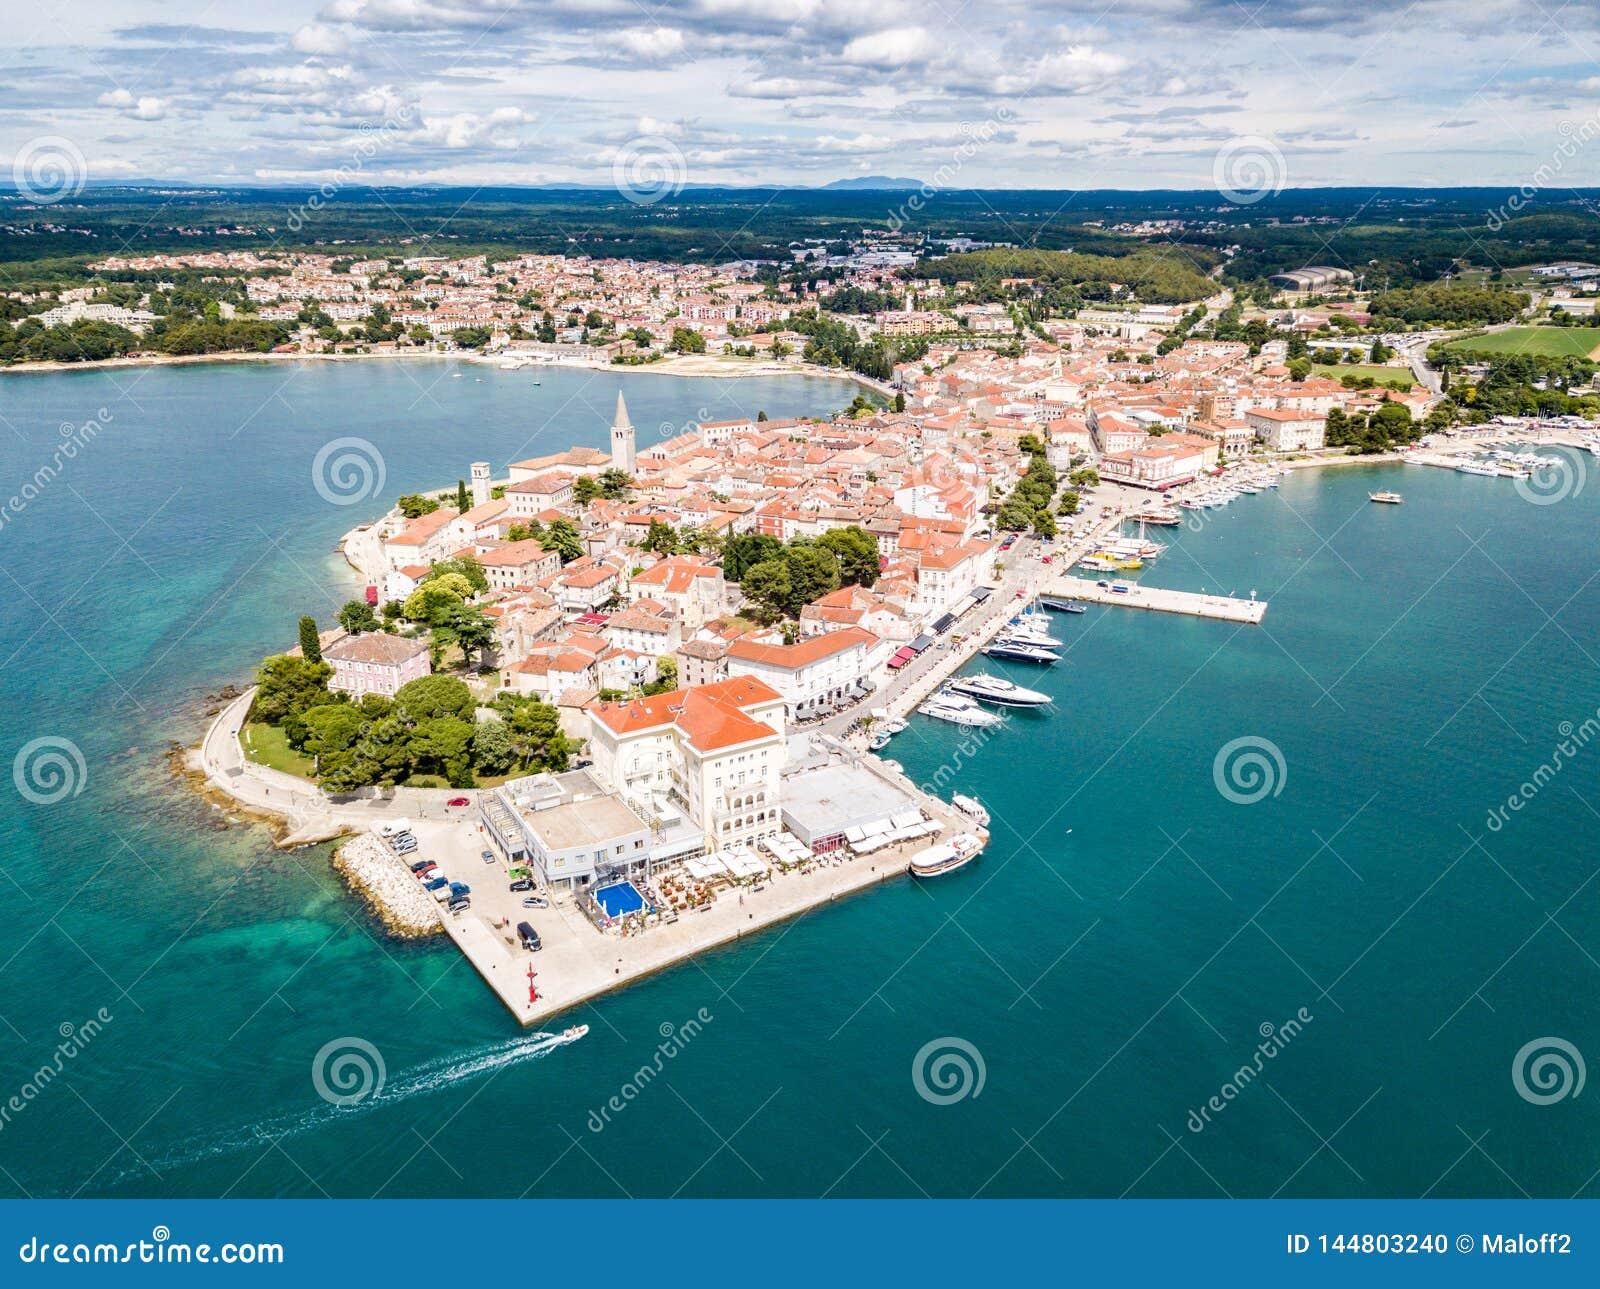 Cidade croata de Porec, costa do mar de adri?tico azul de turquesa dos azuis celestes, pen?nsula de Istrian, Cro?cia Torre de Bel